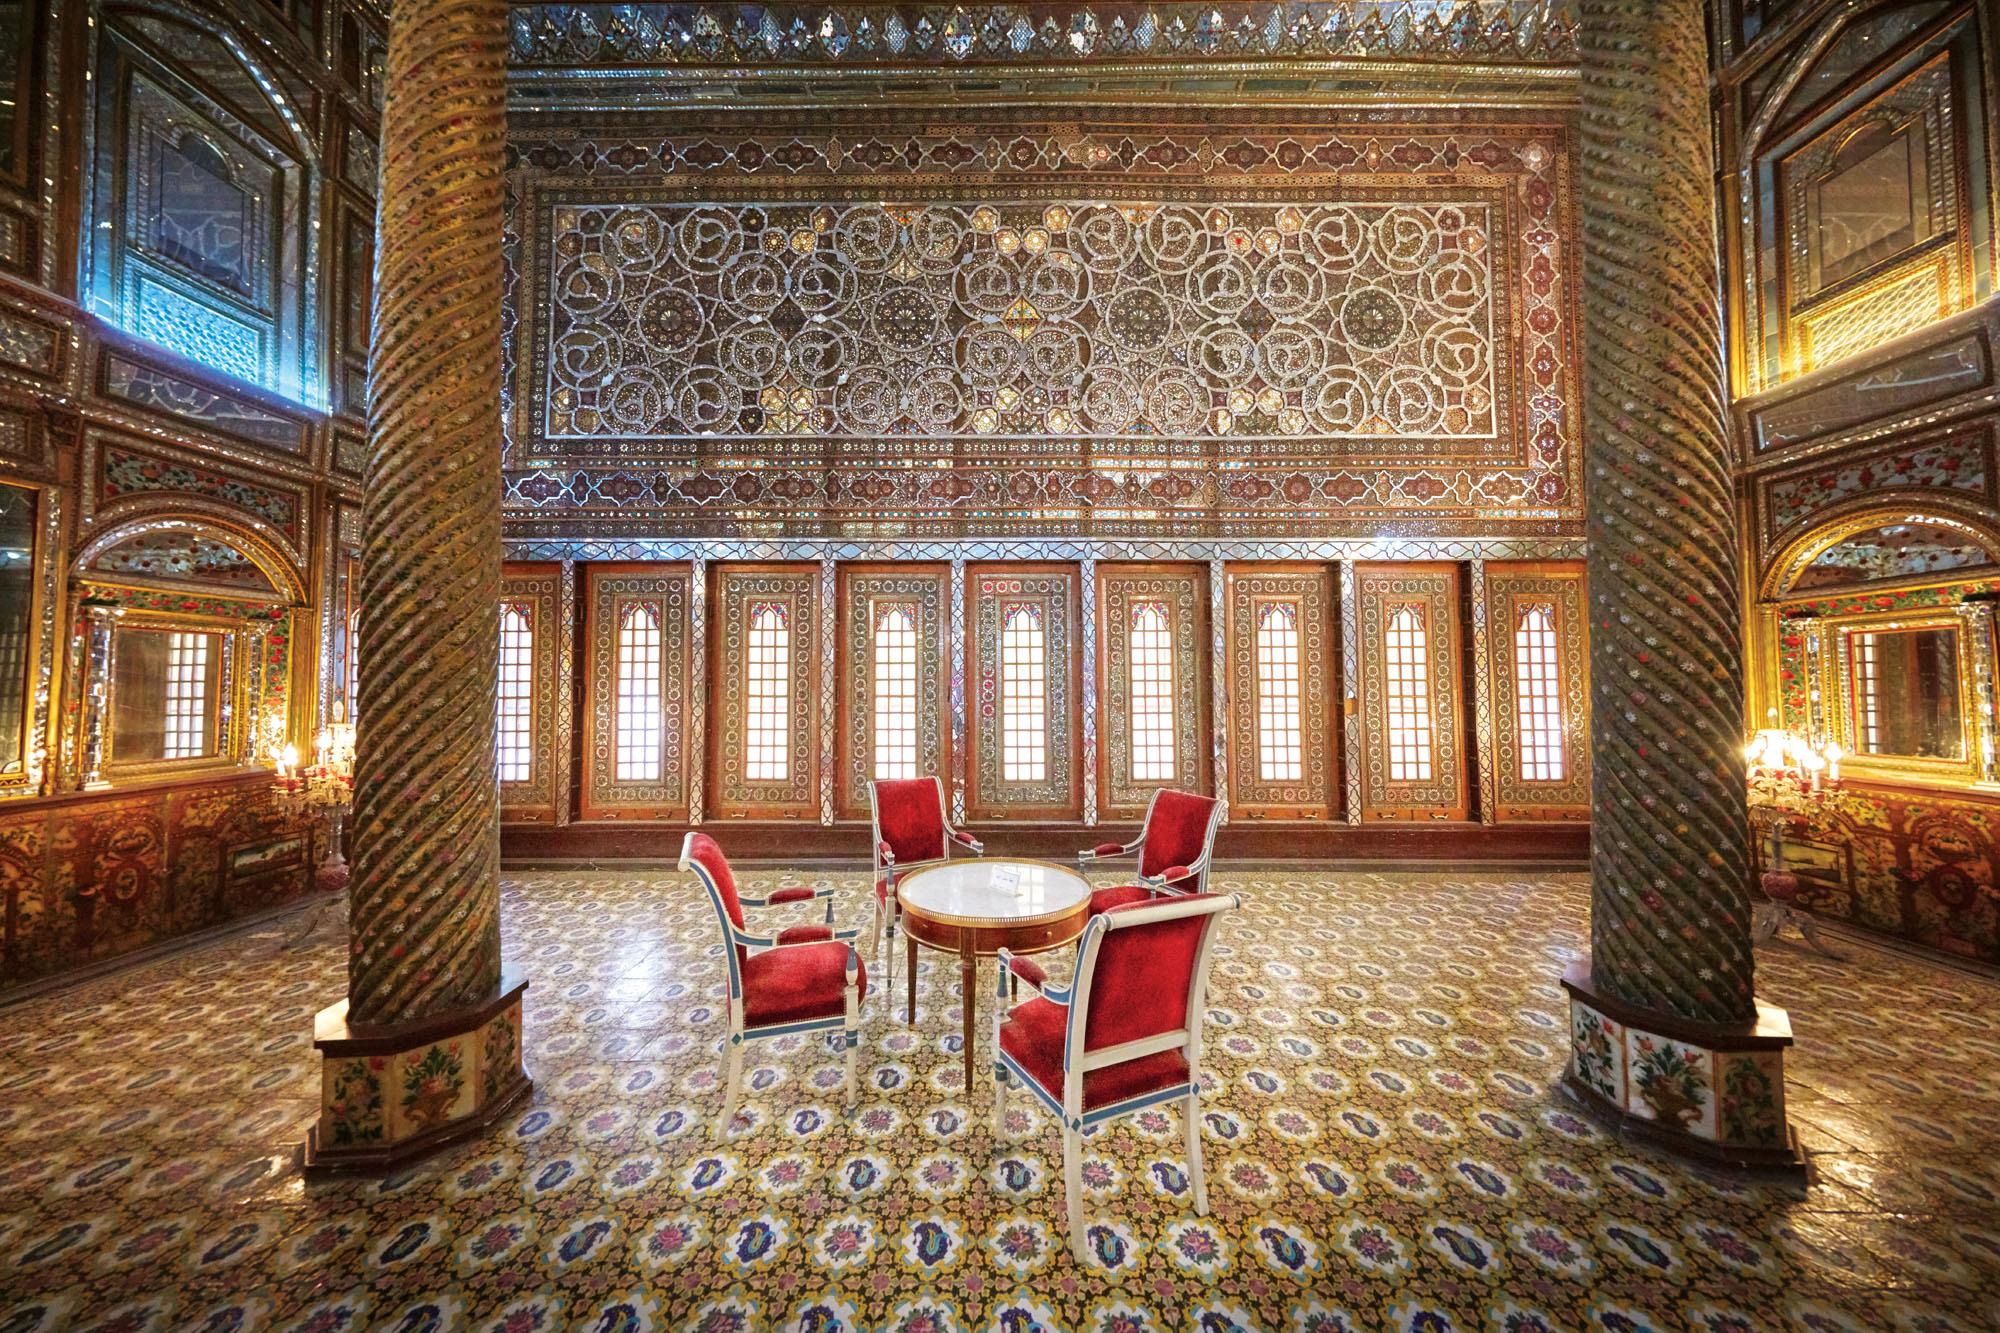 Golestan Palace, Tehran, Iran. Canon EOS 5DSR, 11-14mm lens, f5 @ 1/40 second, ISO 3200.